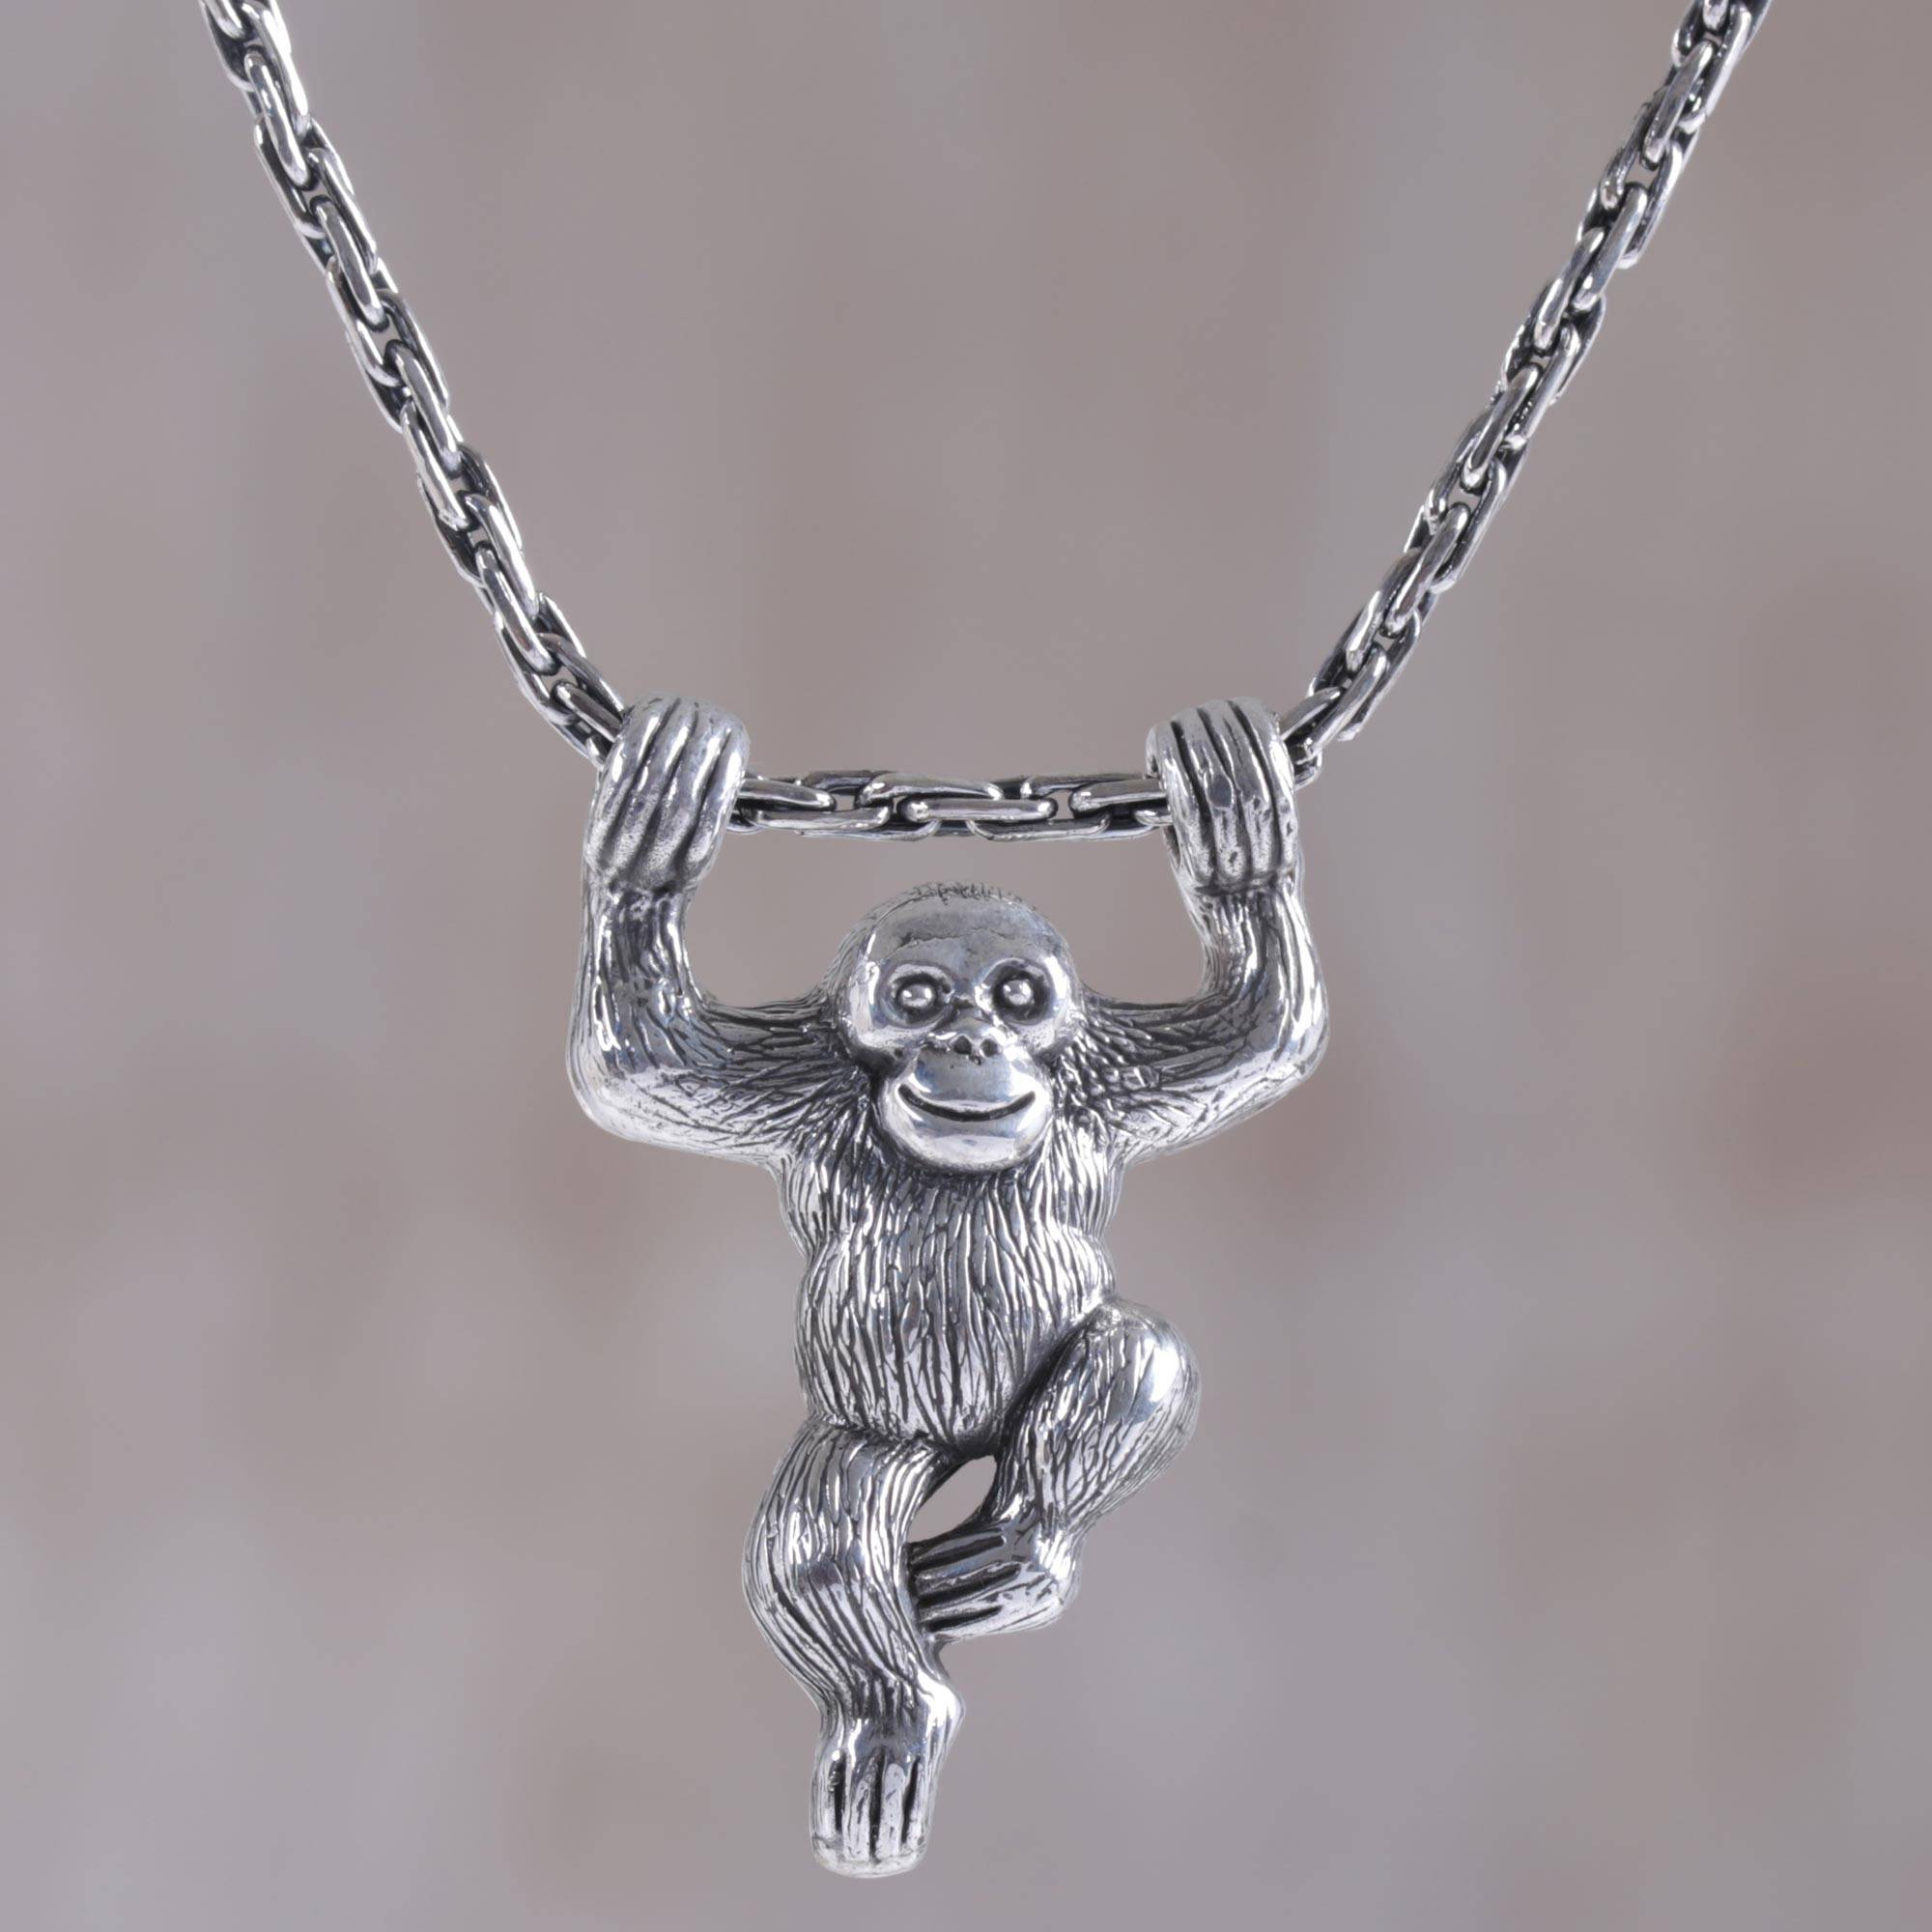 Gt hurleyburley man gt sterling silver men s snake chain bracelet - Sterling Silver Pendant Necklace Monkey Charm Sterling Silver Monkey Pendant Necklace From